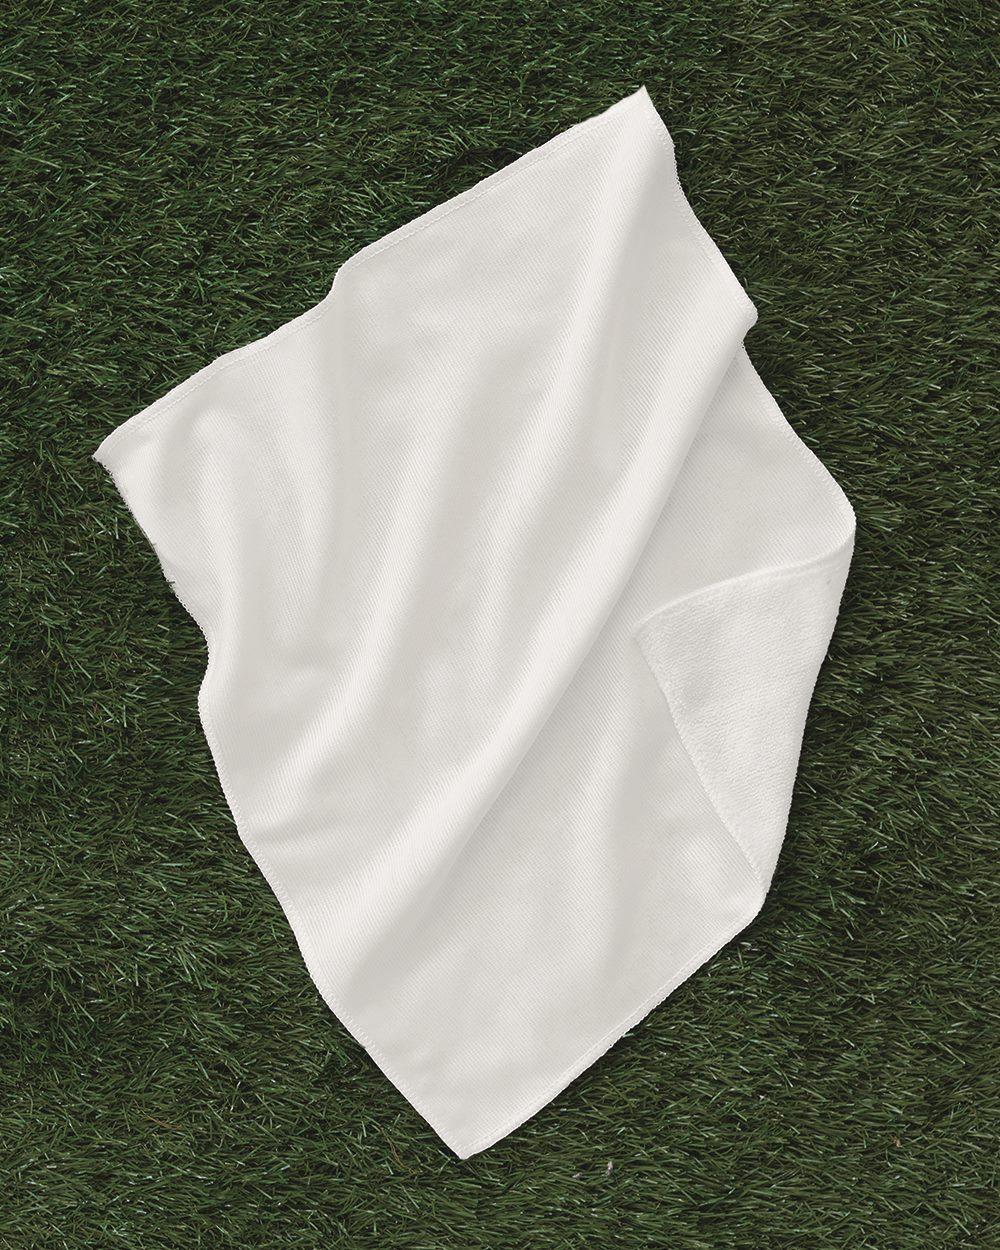 Carmel Towel Company CSUB1518 - Sublimation Towel